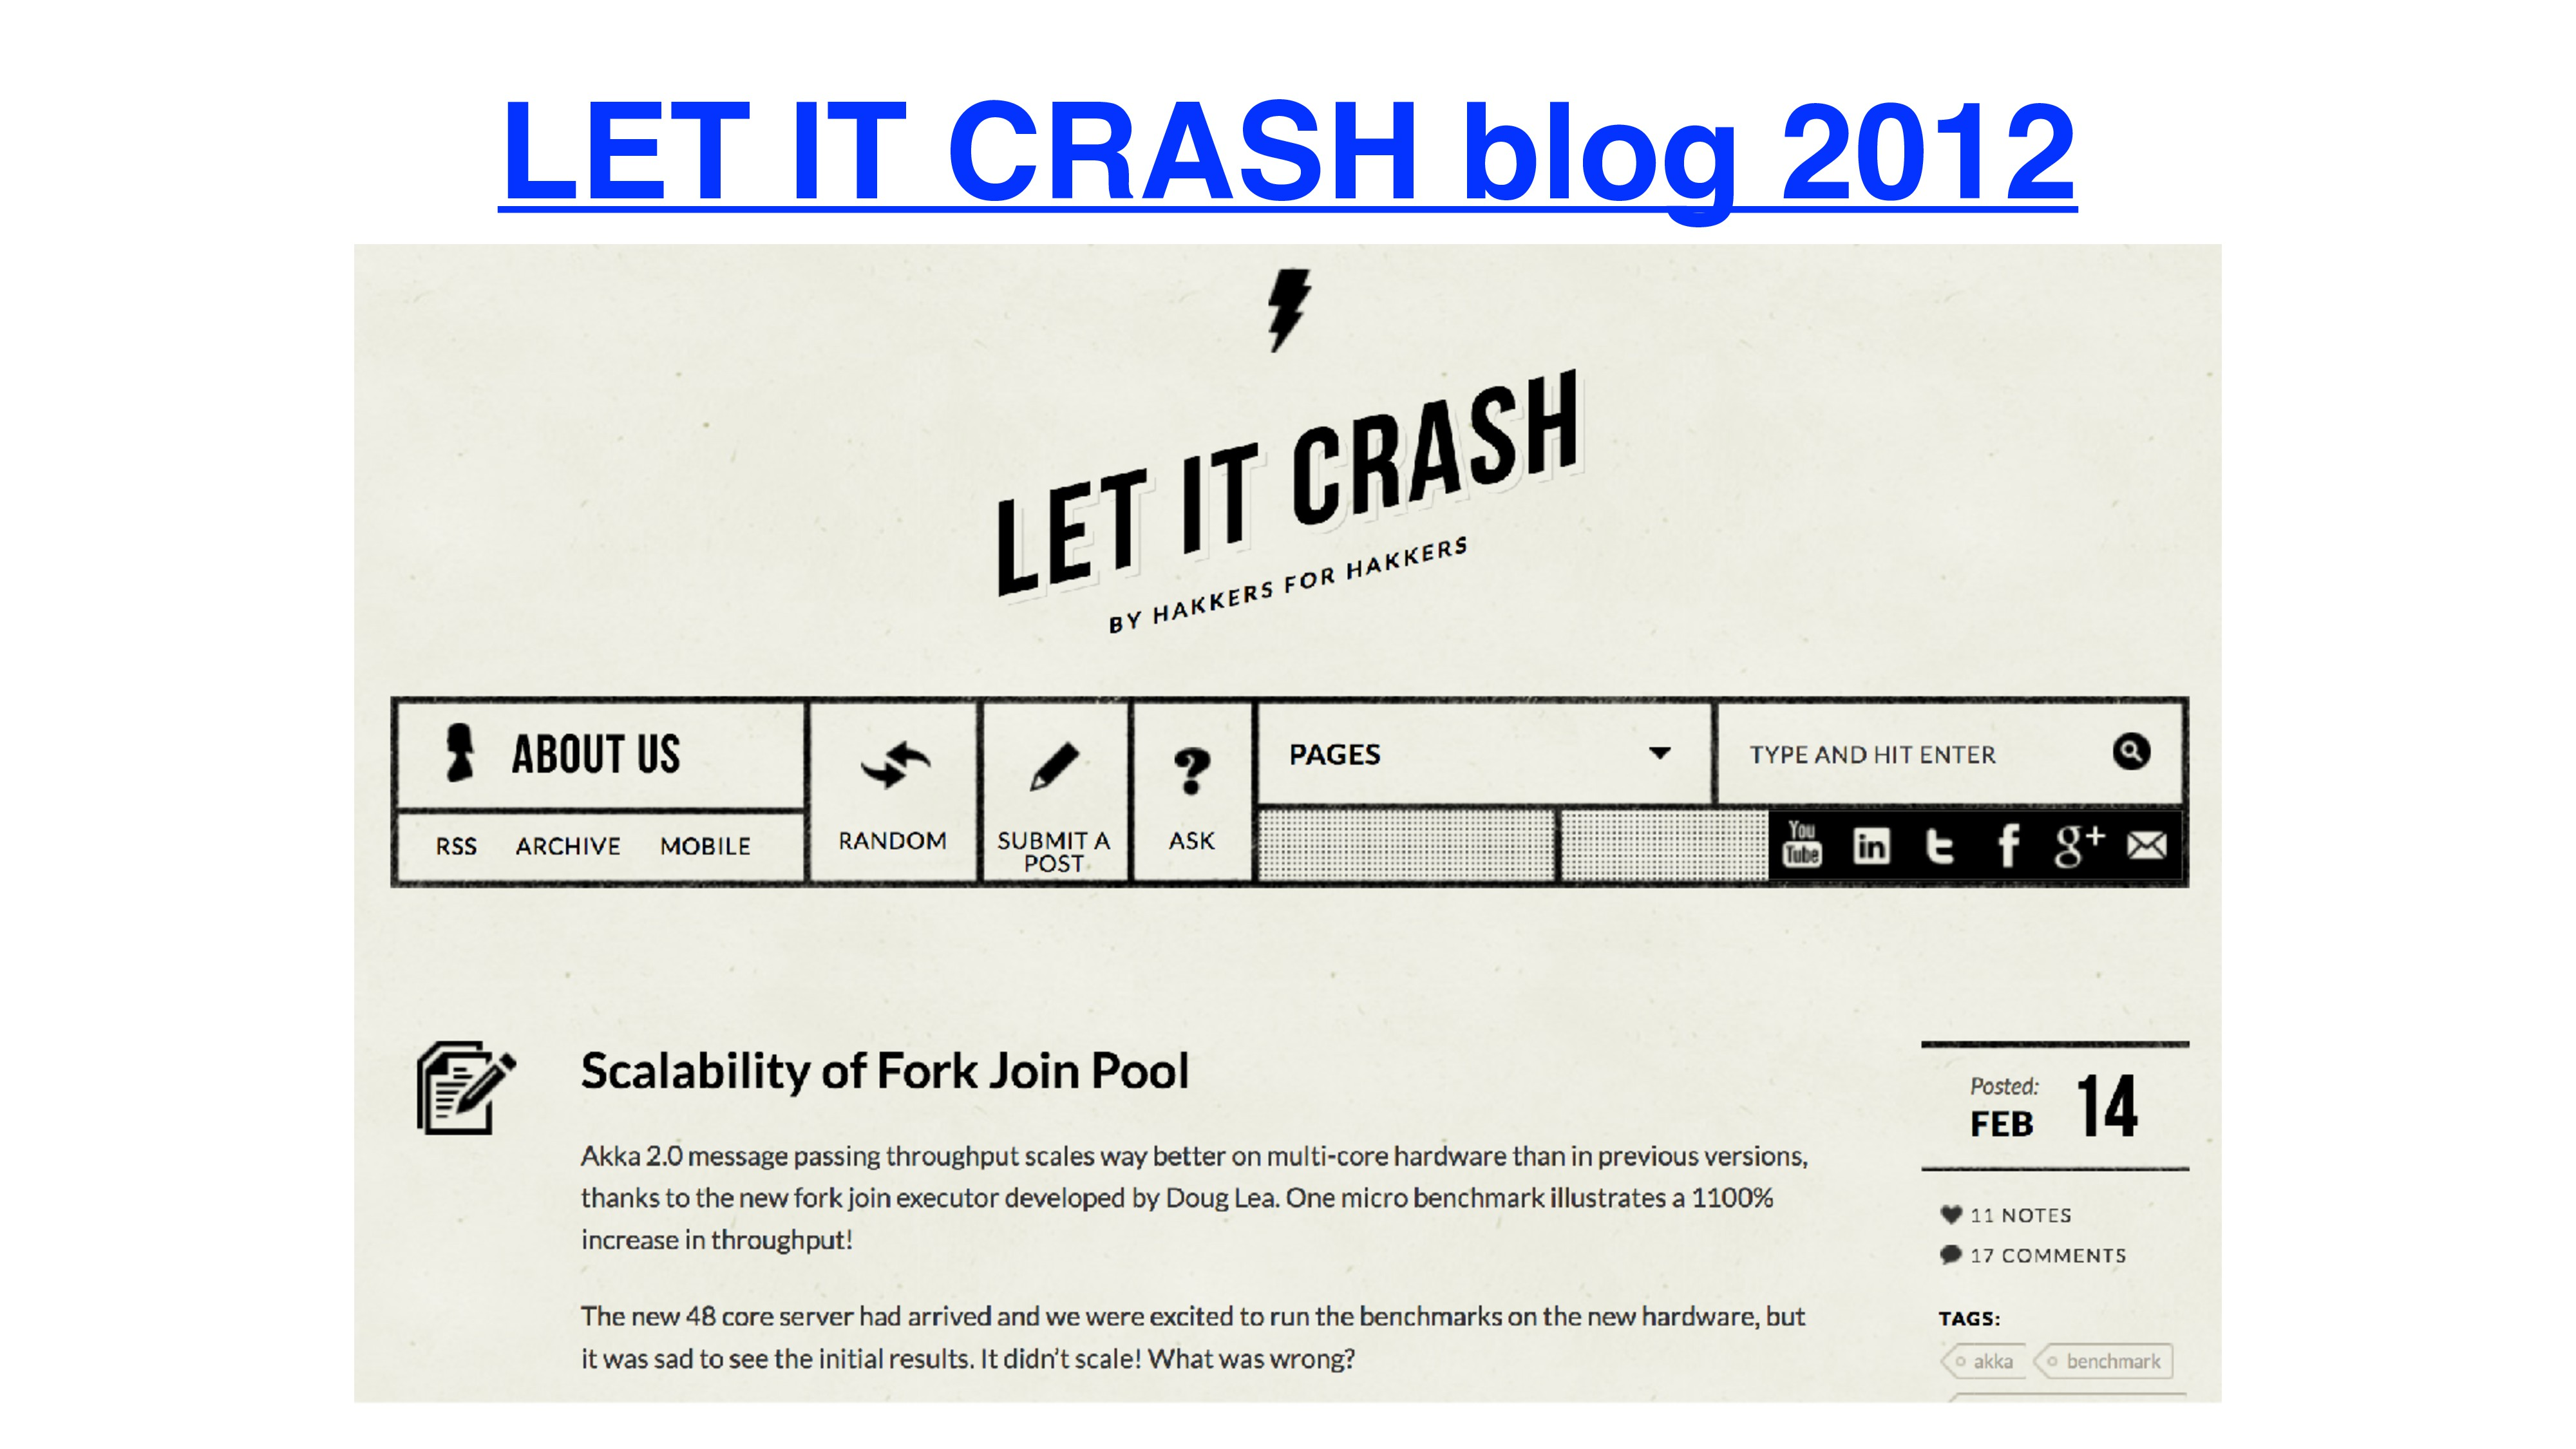 LET IT CRASH blog 2012